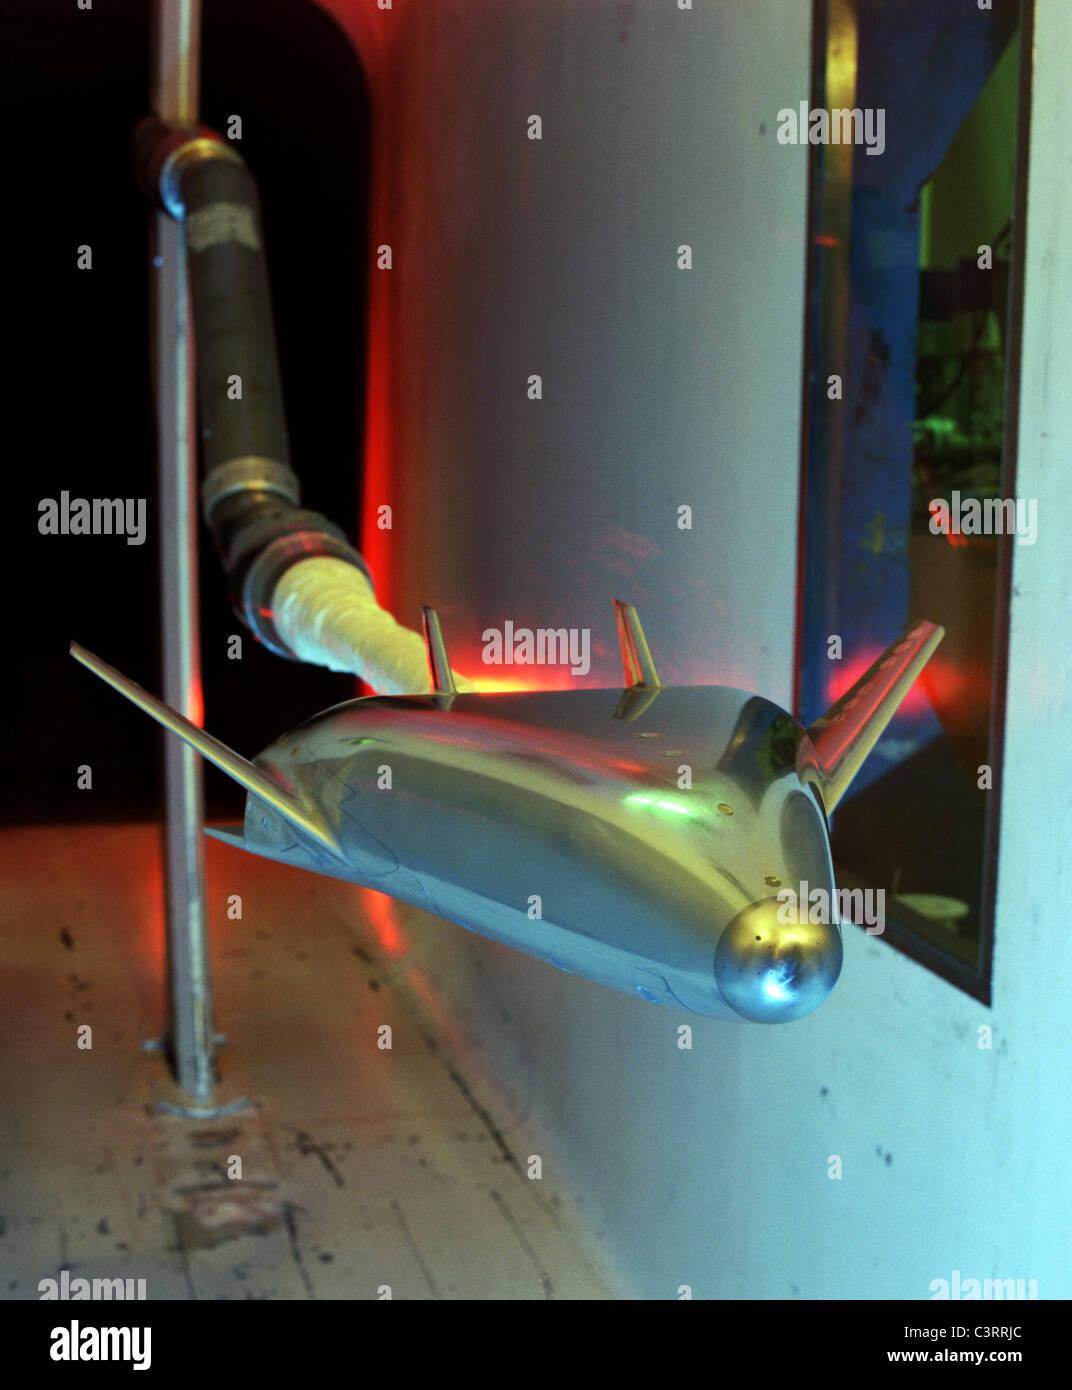 X-33 Metal Model Testing In Low Turbulence Pressure Tunnel - Stock Image